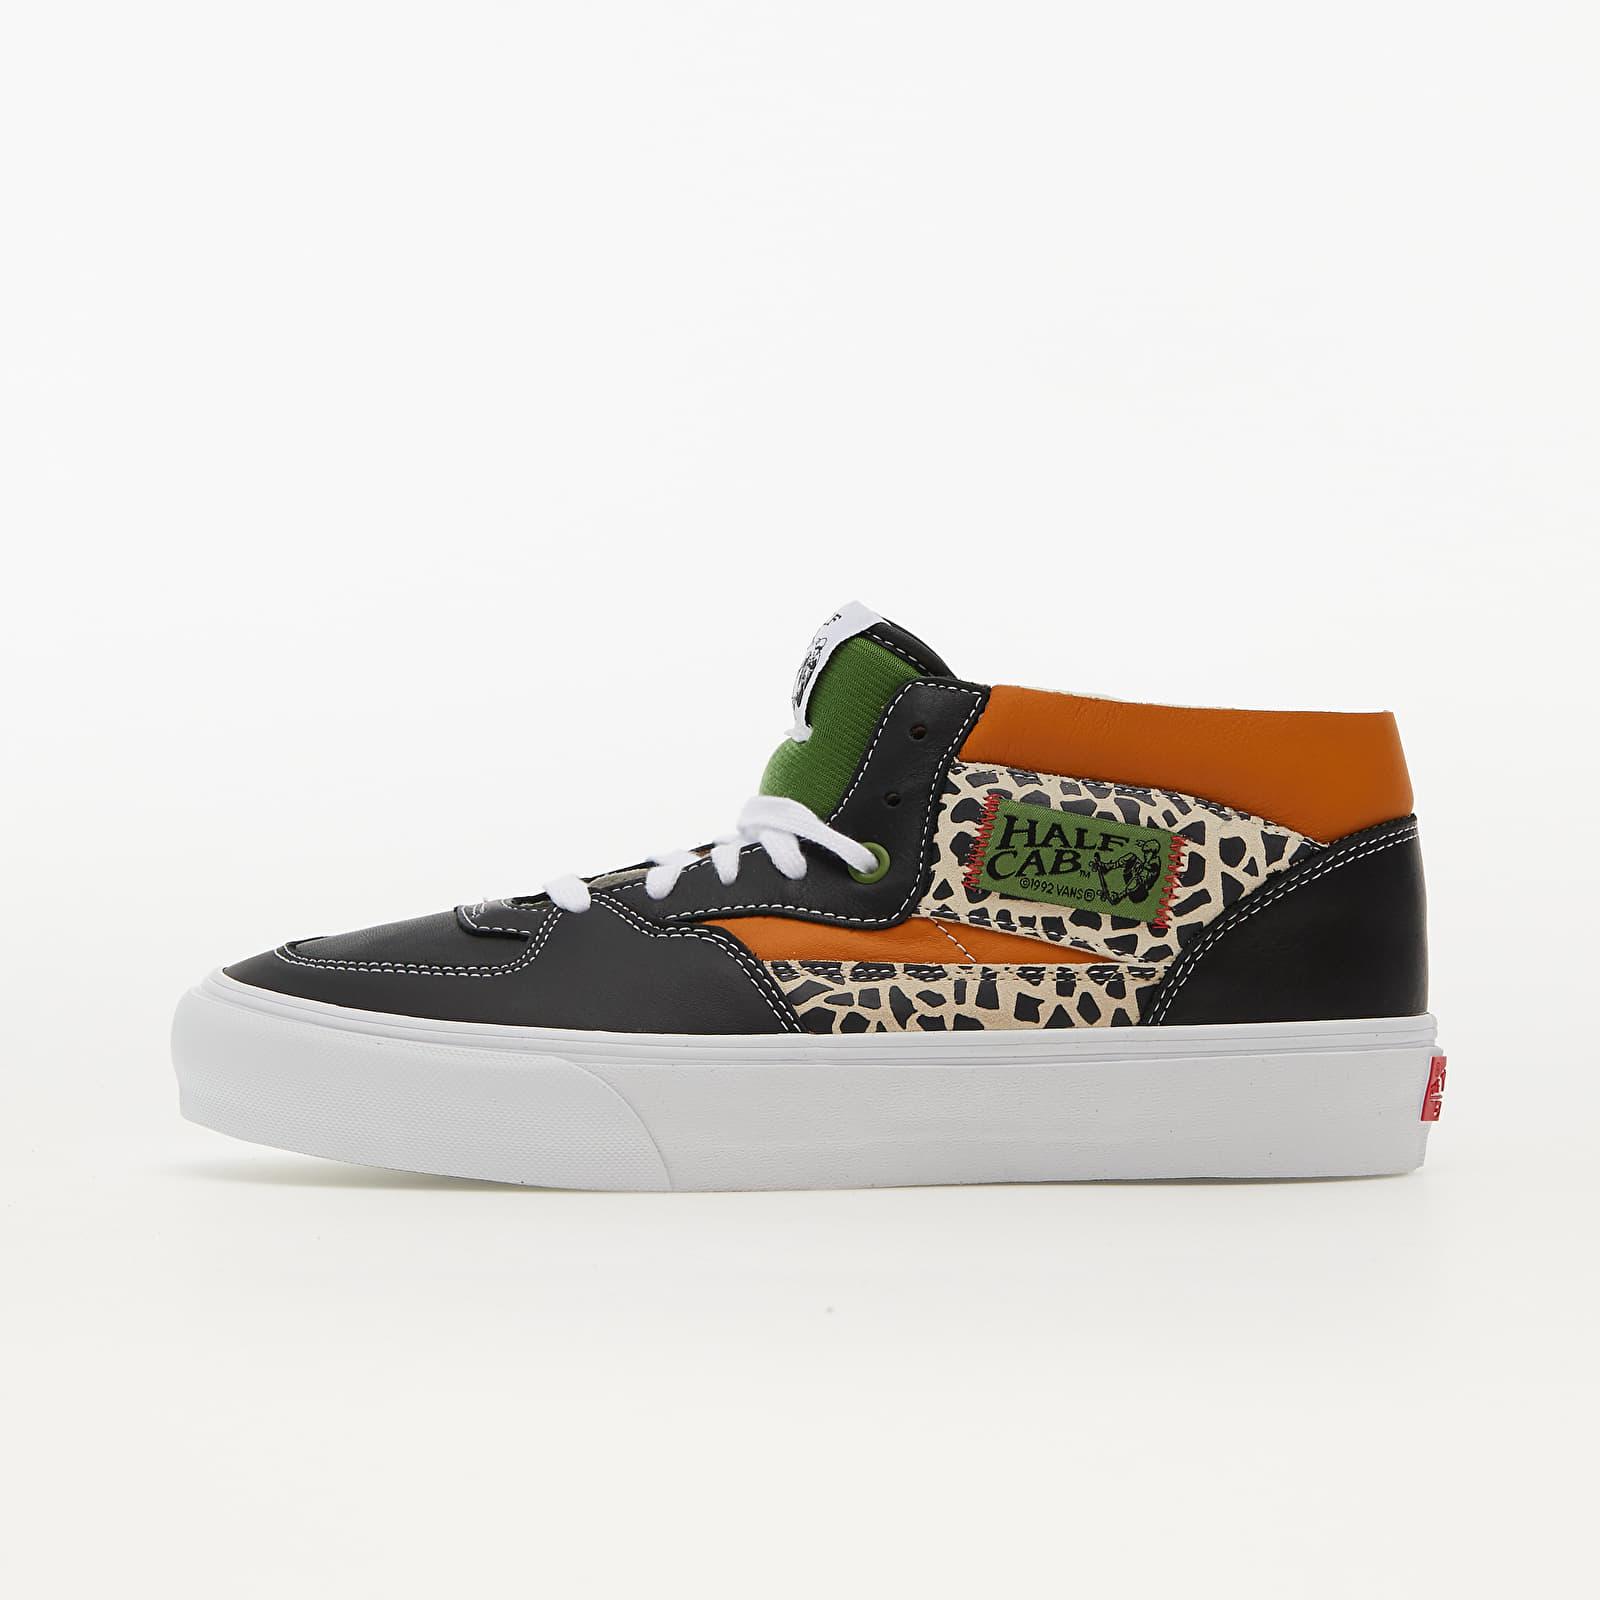 Vans Vault Half Cab EF LX (Leather/ Suede) Cactus/ Black   Footshop